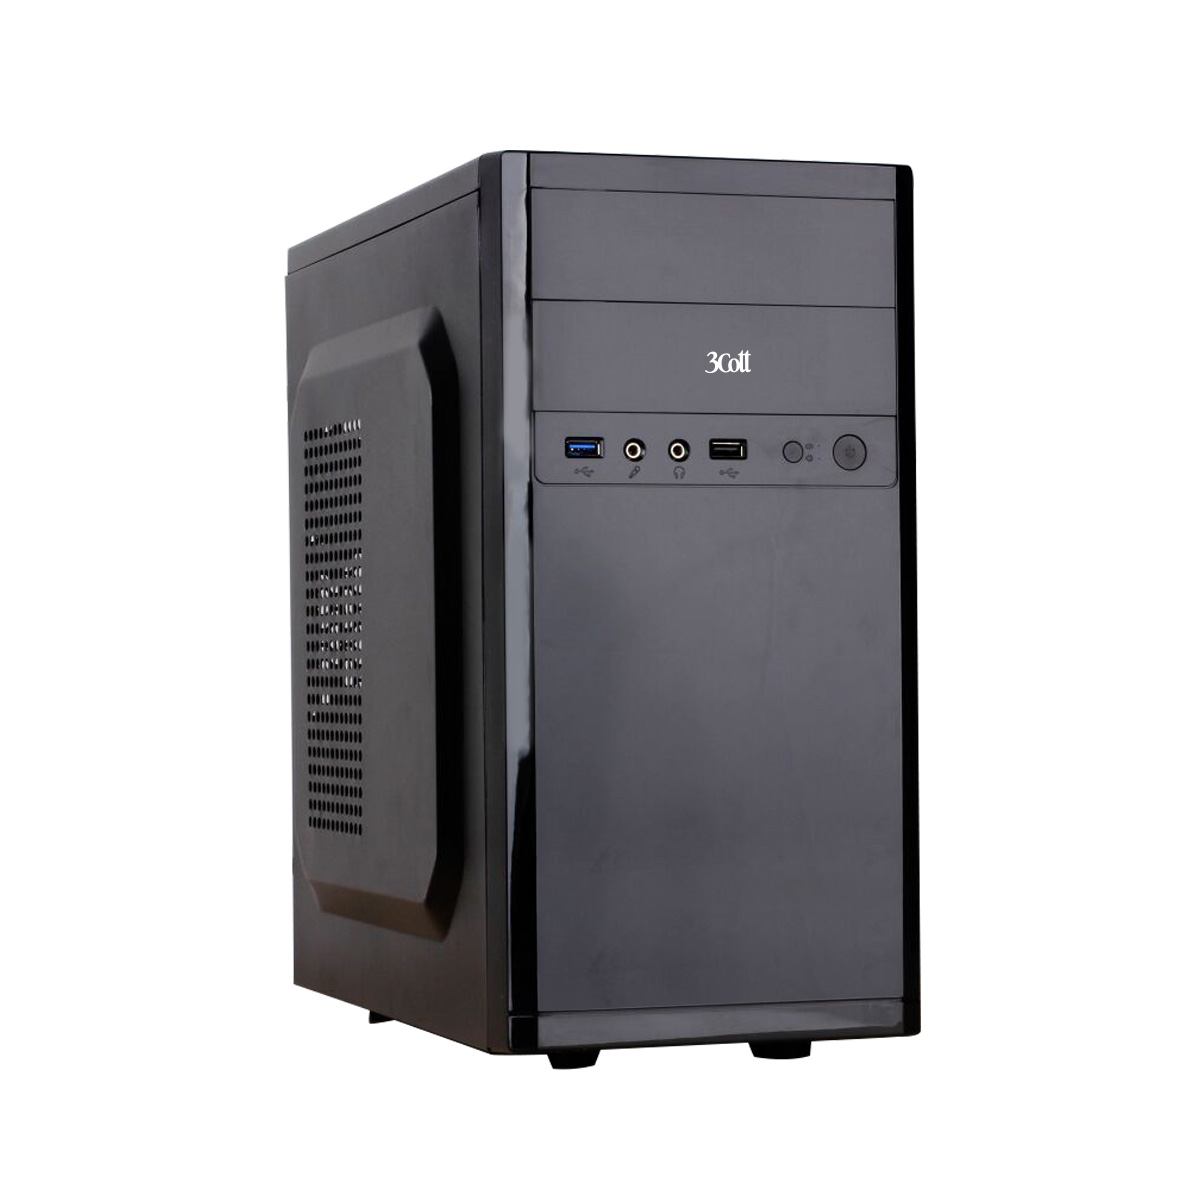 Компьютер Office 116 (2018) >AMD A4-SERIES A4-6300, 4096 Mb, AMD RAD HD8370D, 1000 HDD, NO DVD, WIN10